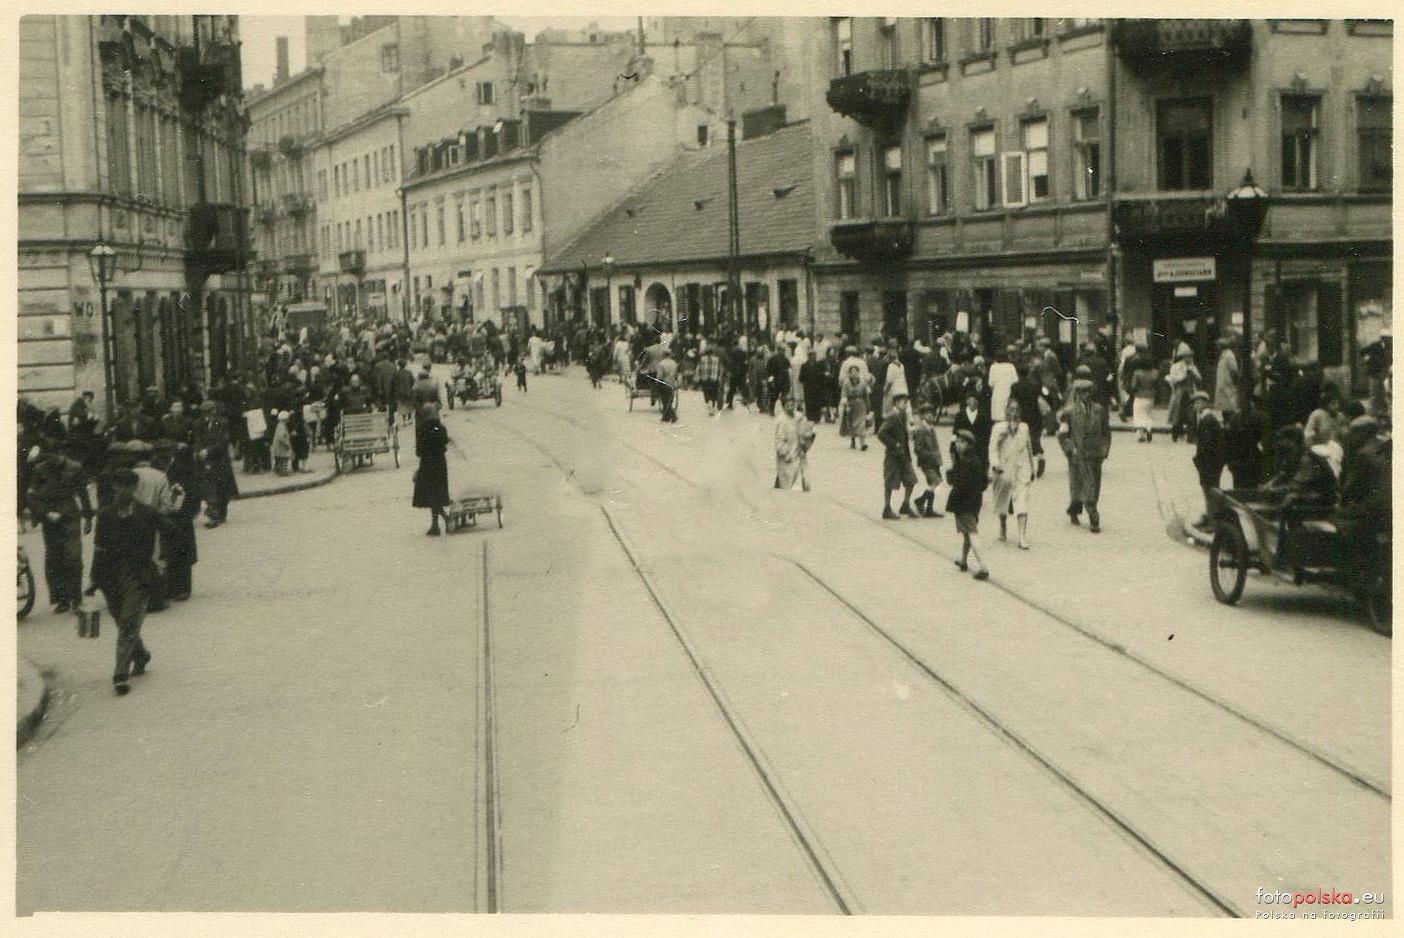 _en_Smocza_13_Nowolipki_53_r_g_fotopolska.eu_1941.jpg